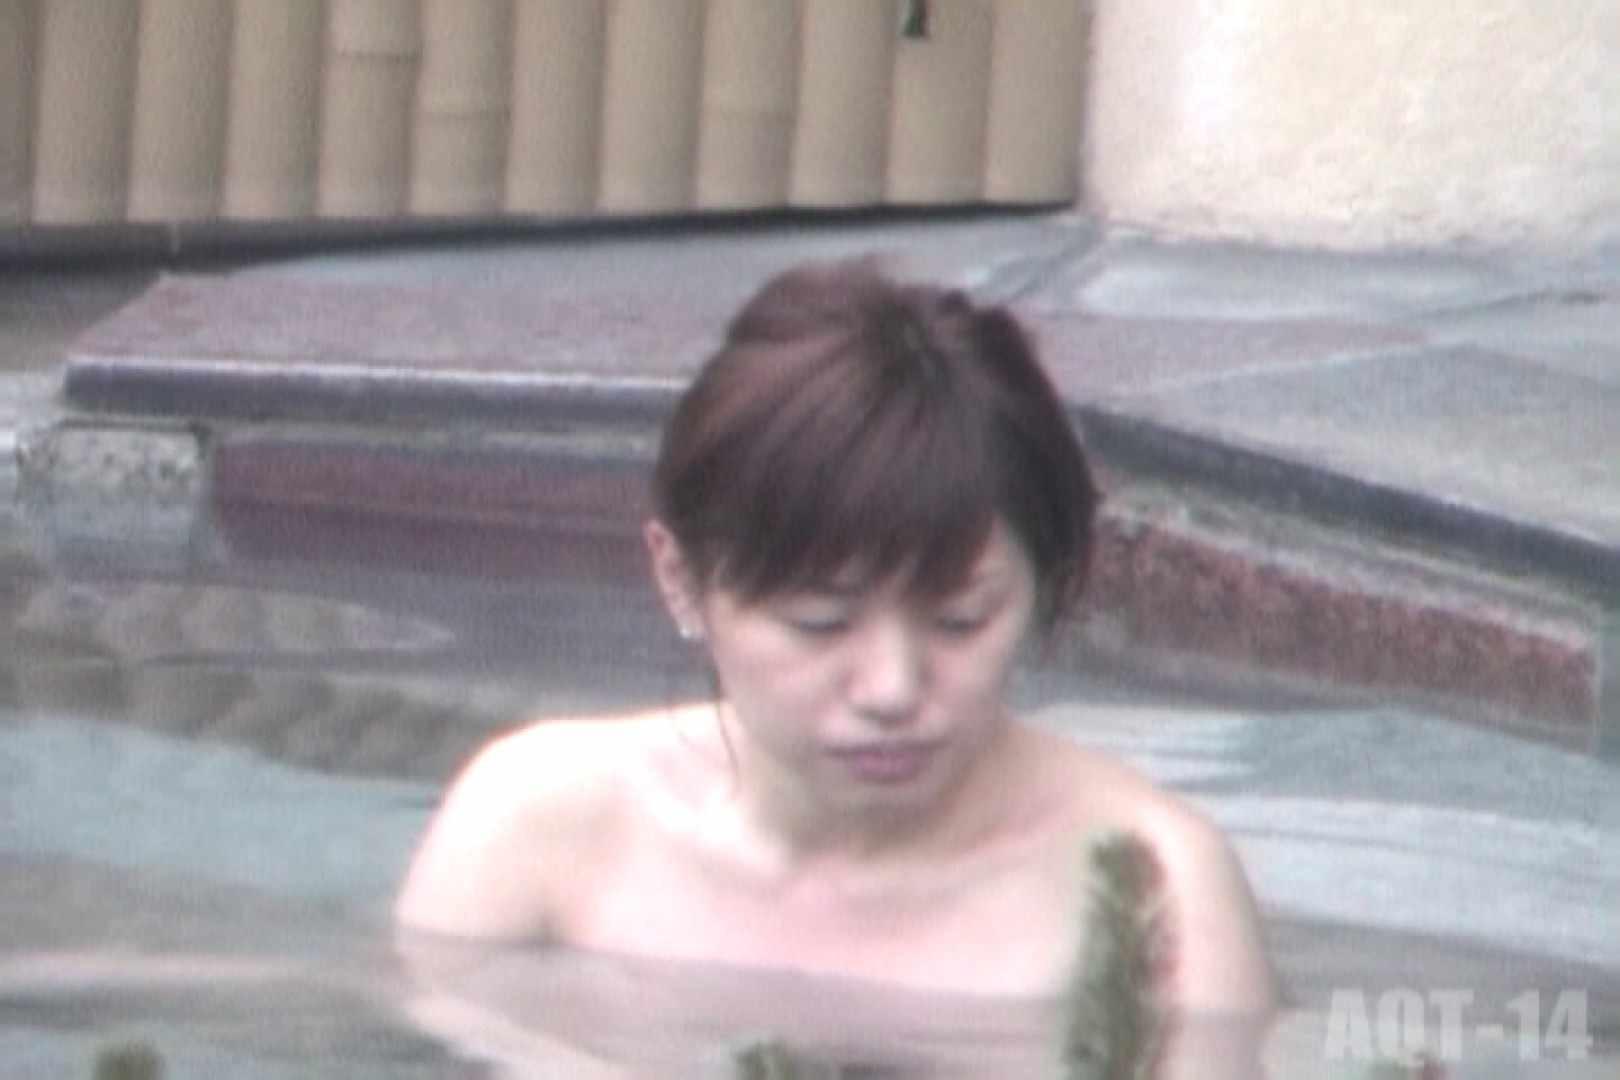 Aquaな露天風呂Vol.821 露天風呂突入   盗撮師作品  78pic 58